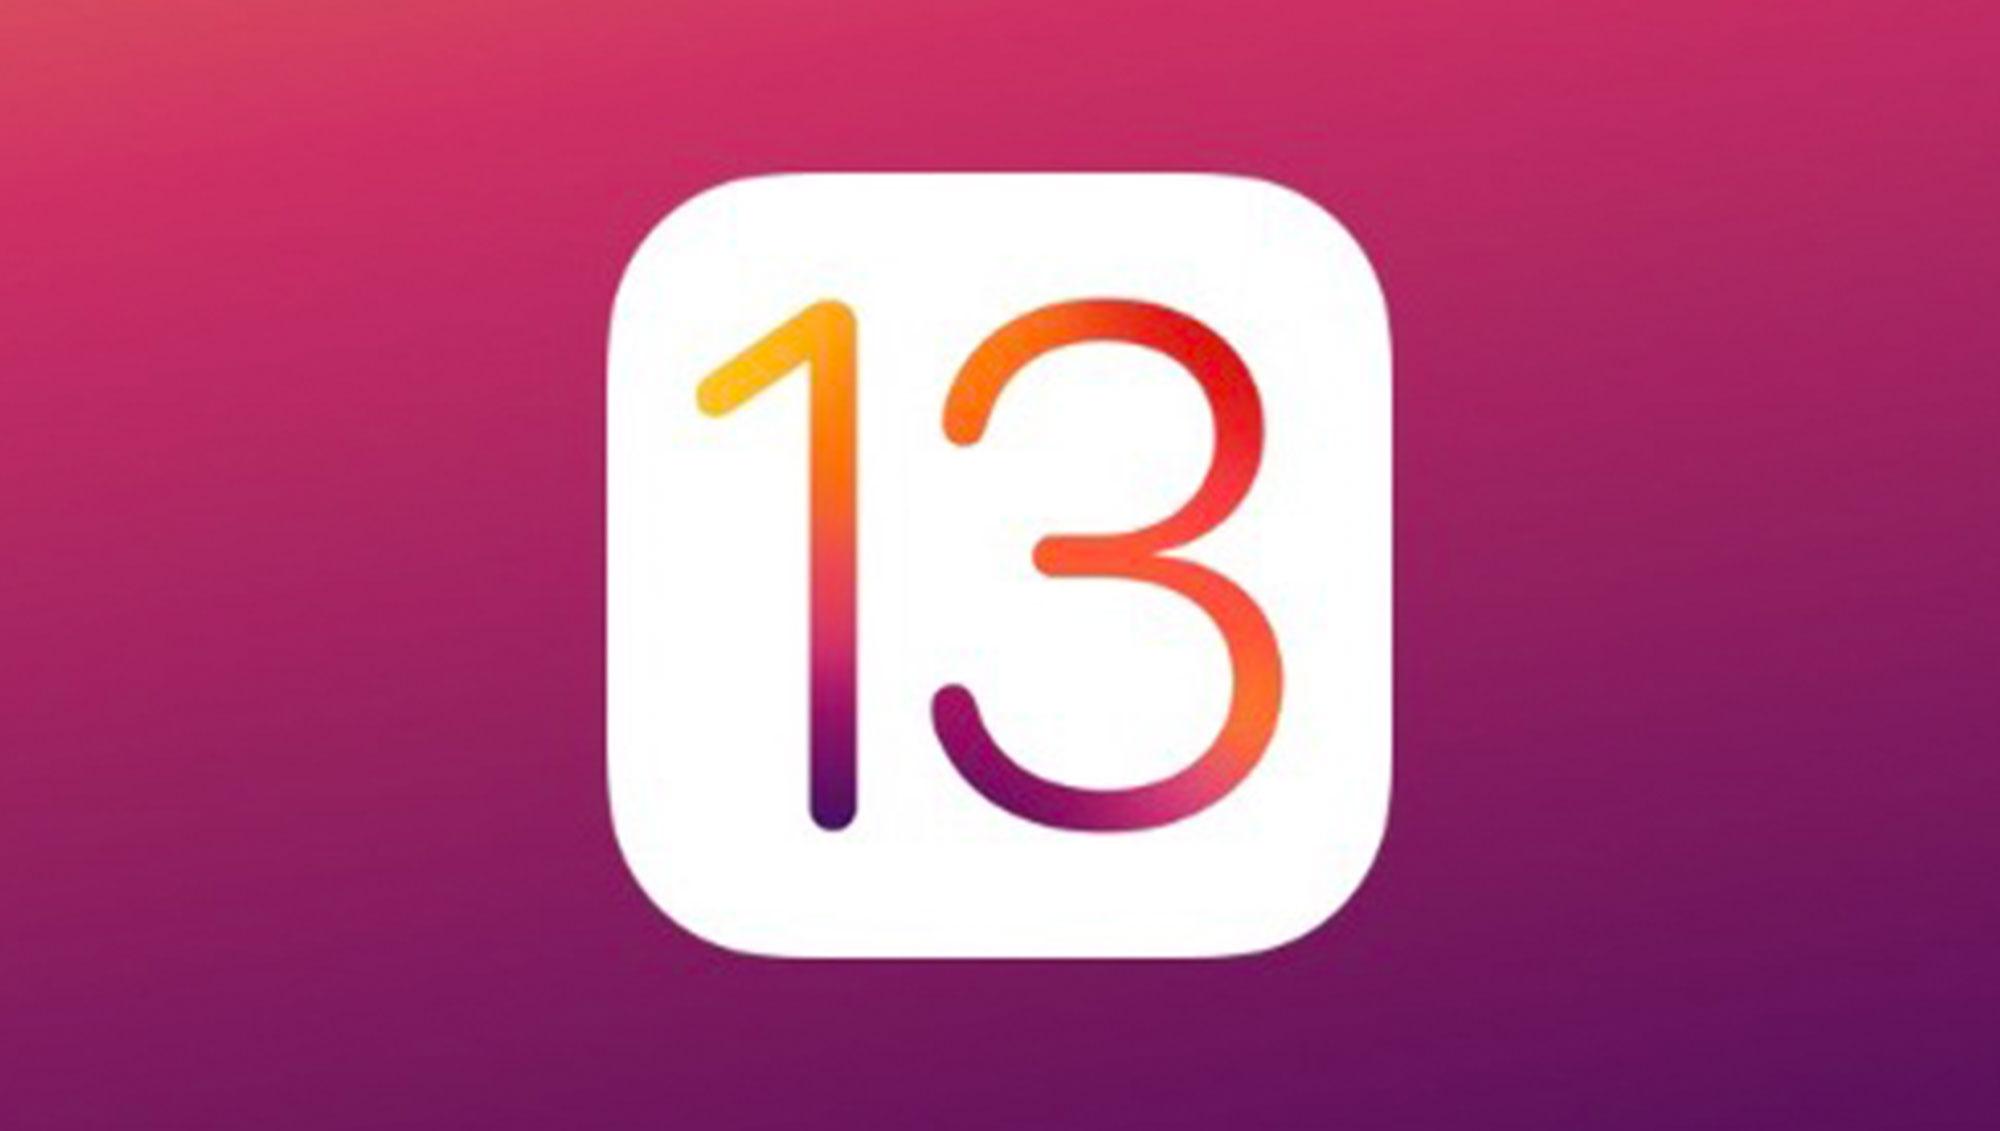 iOS13第二个公测版更新了什么内容?有哪些改进和修复?